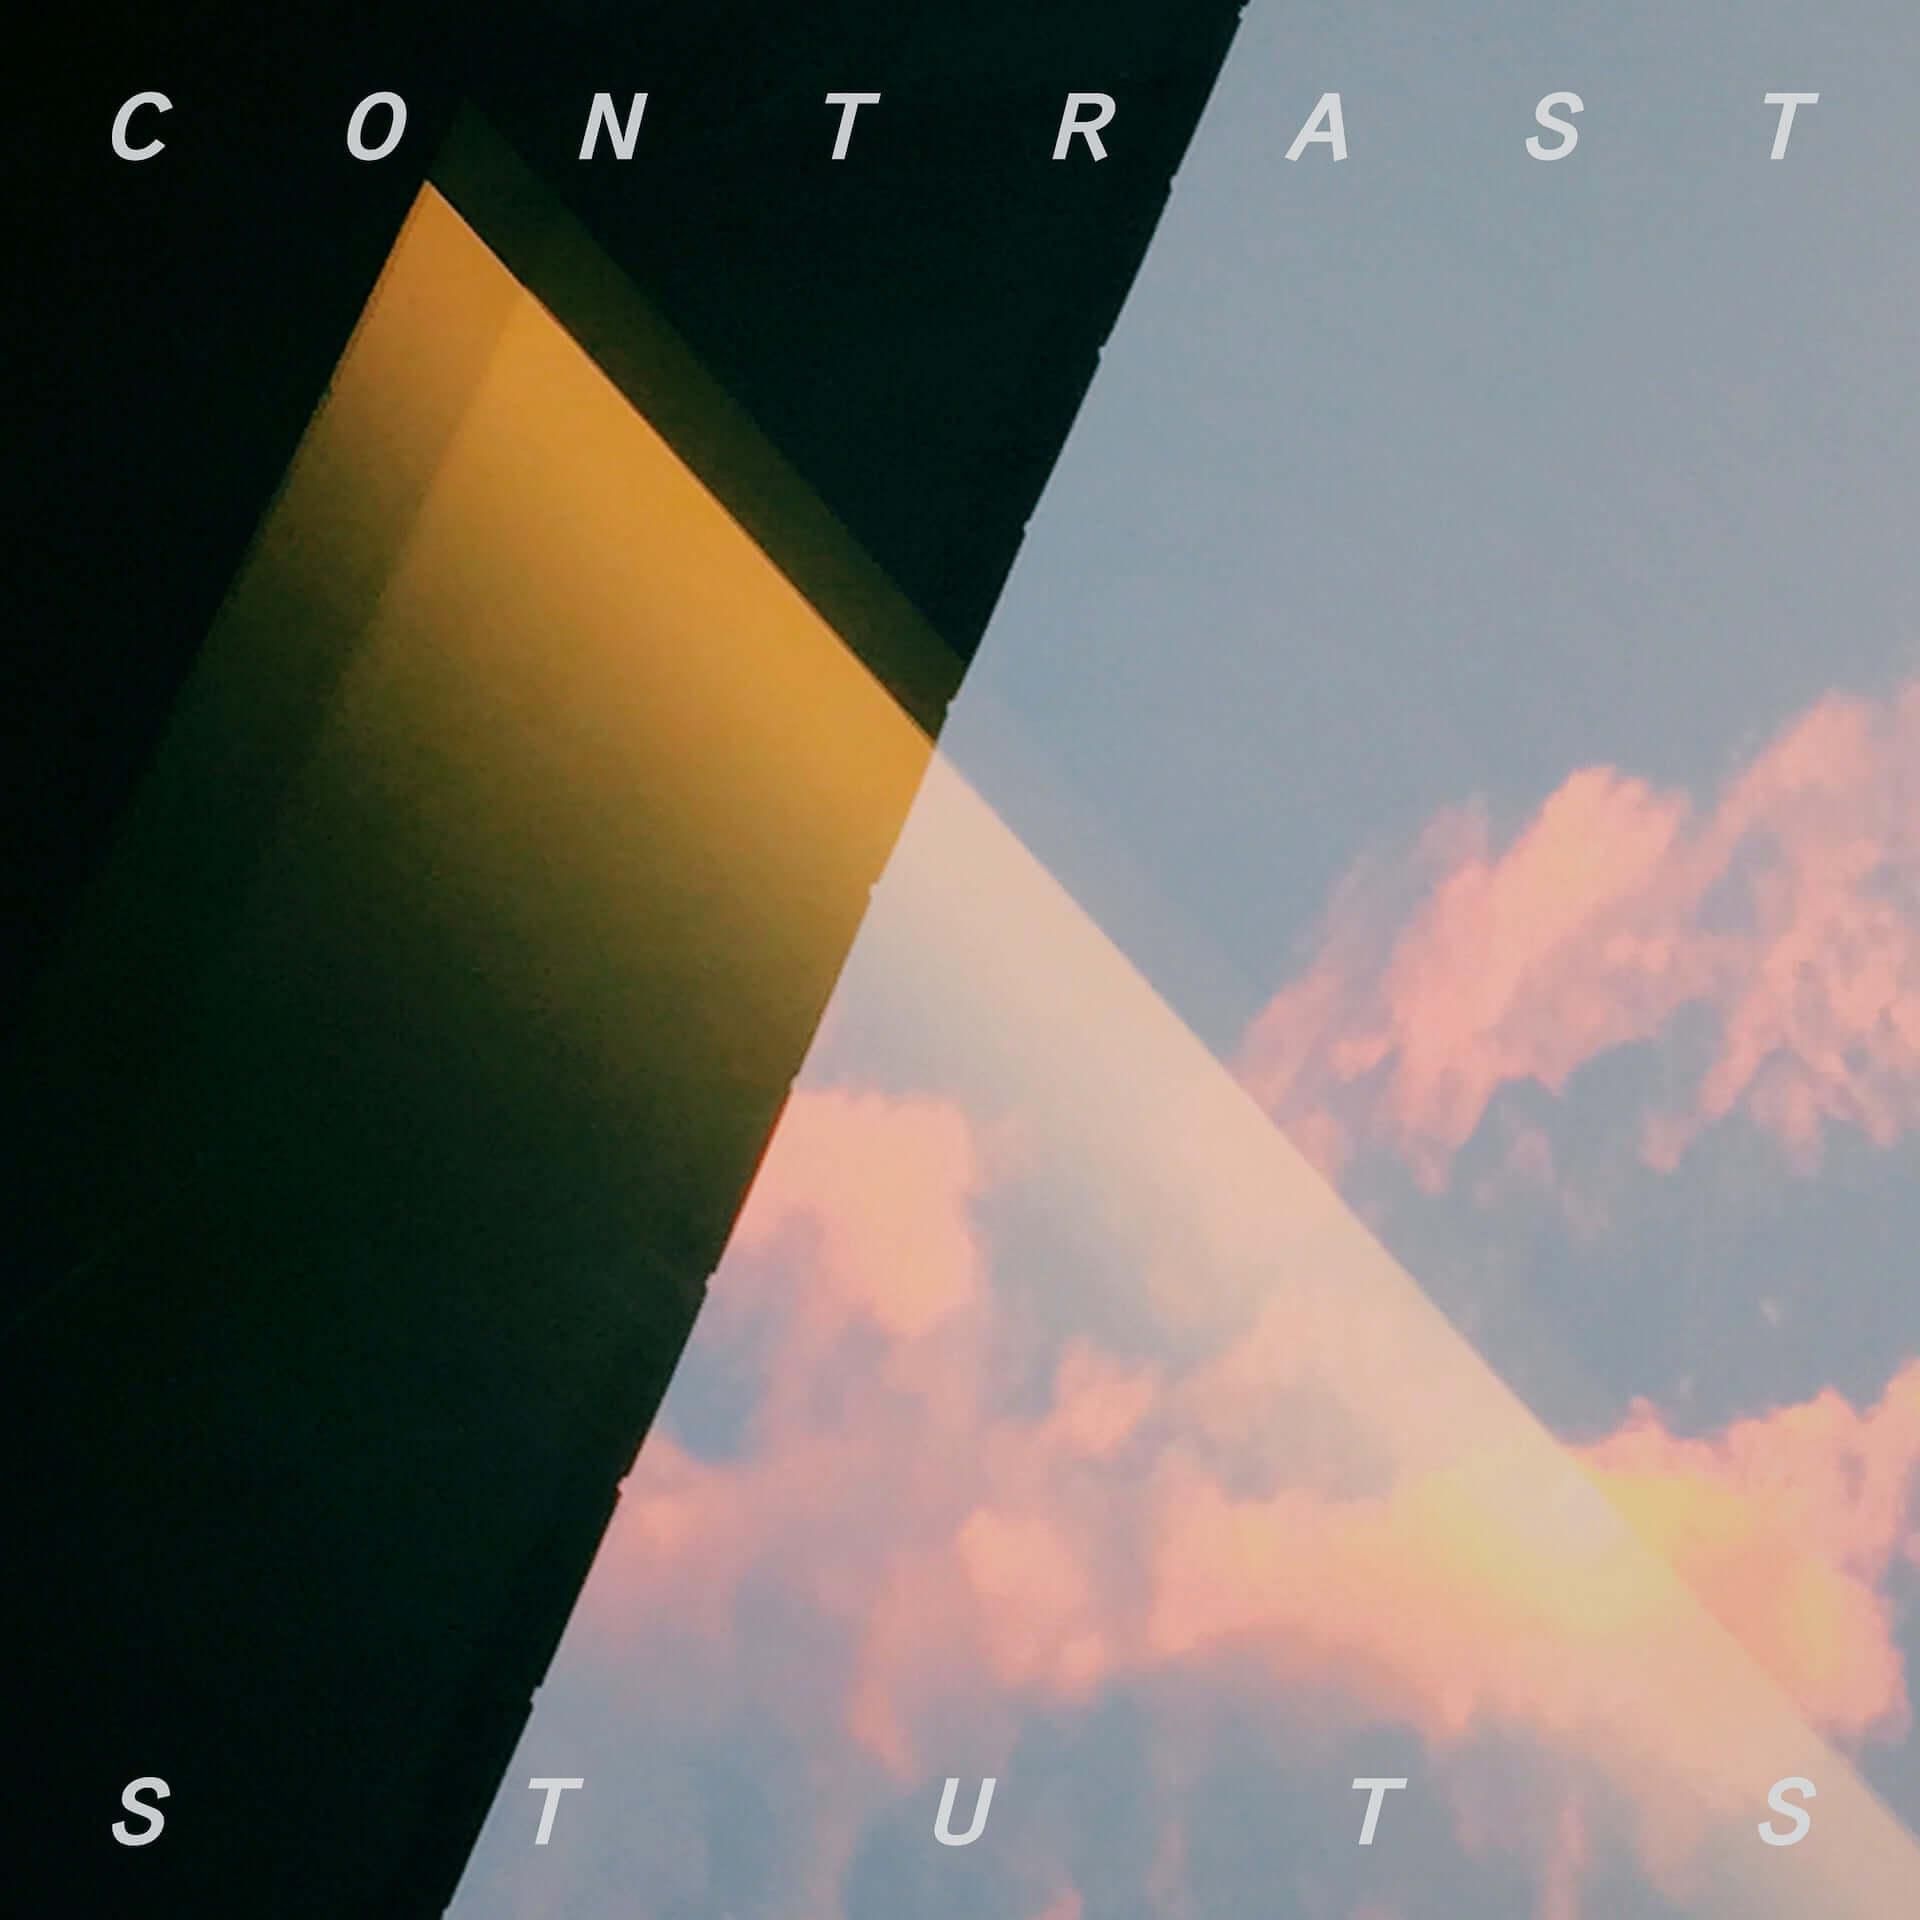 "STUTSが新作『Contrast』のリリースライブを東名阪で開催決定!先行シングル""Conflicted""のオフィシャルオーディオも公開 music200902_stuts_1-1-1920x1920"